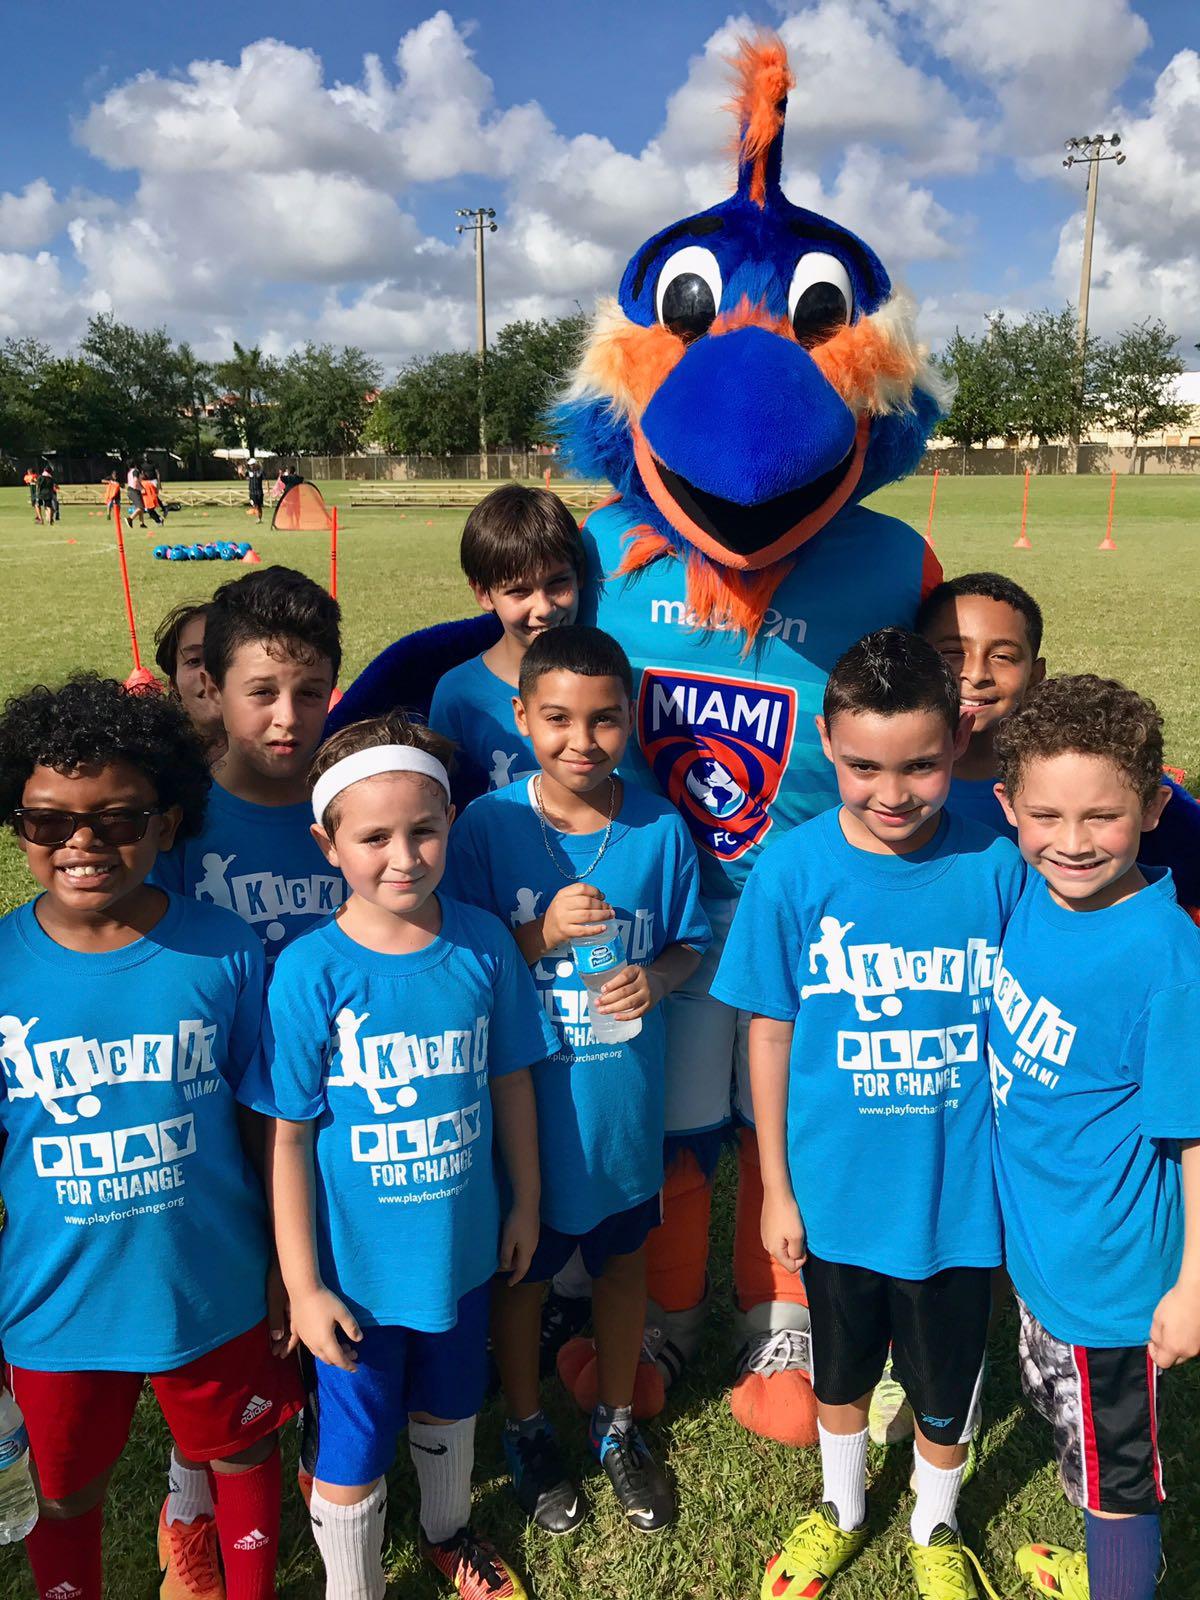 Miami FC mascot with children from Kick It